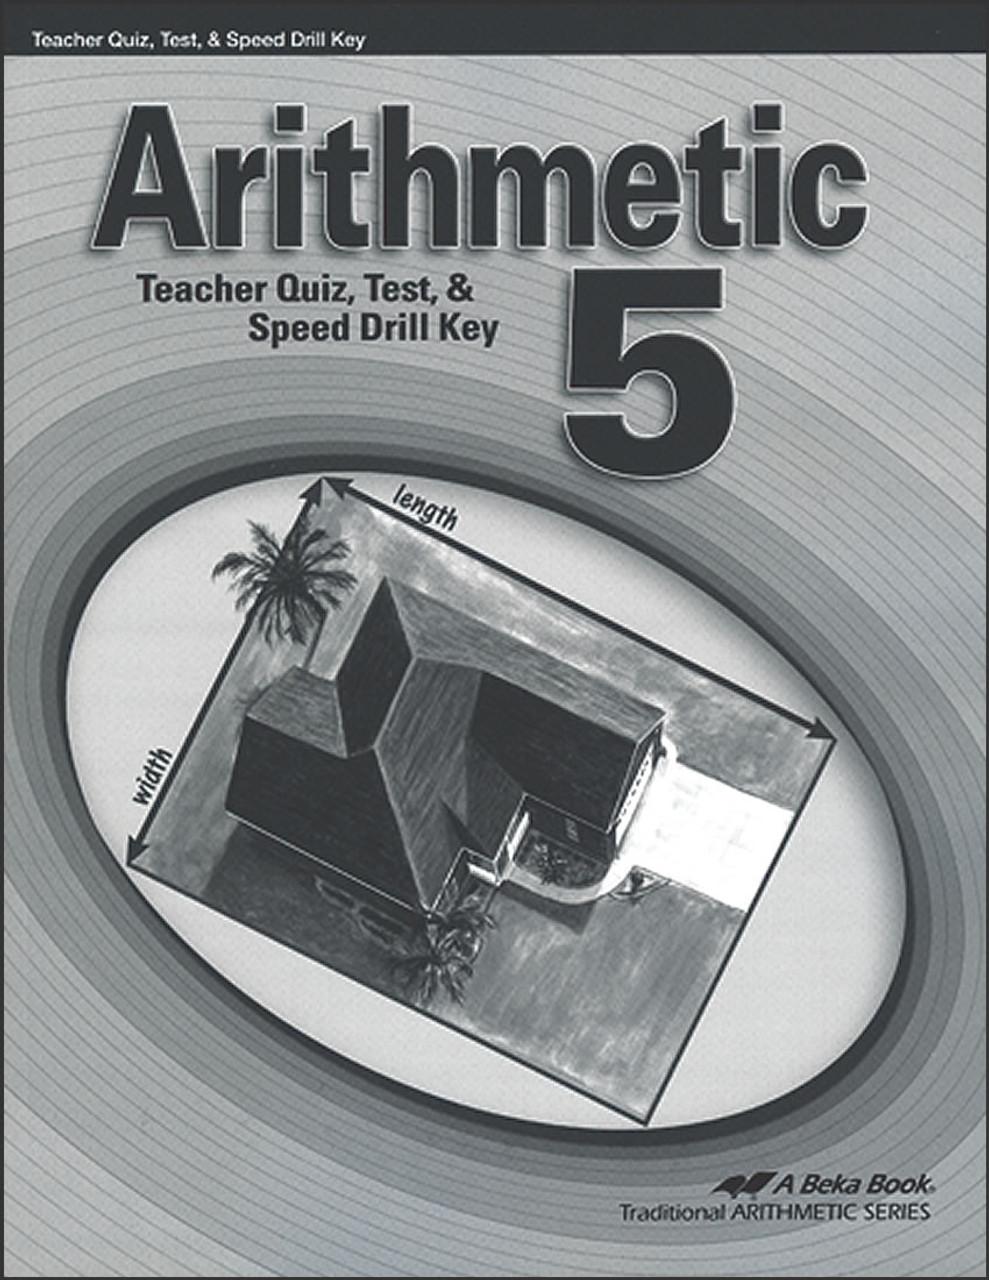 Arithmetic 5, 4th edition - Teacher Quiz, Test, & Speed Drill Key